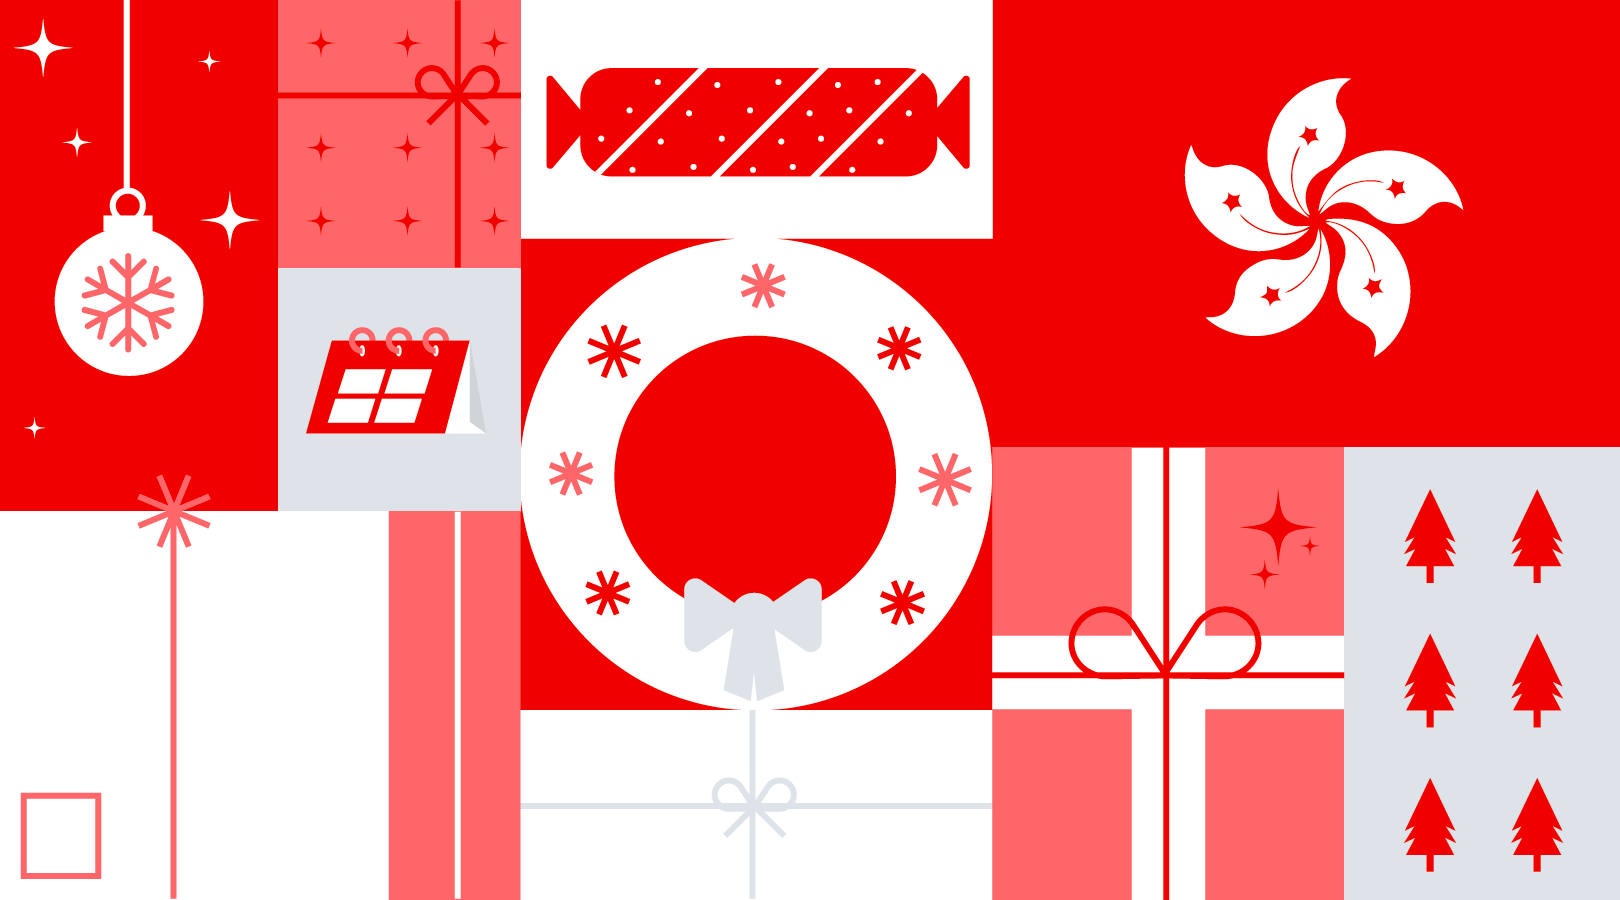 Hong Kong Last Posting Dates For Christmas 2020